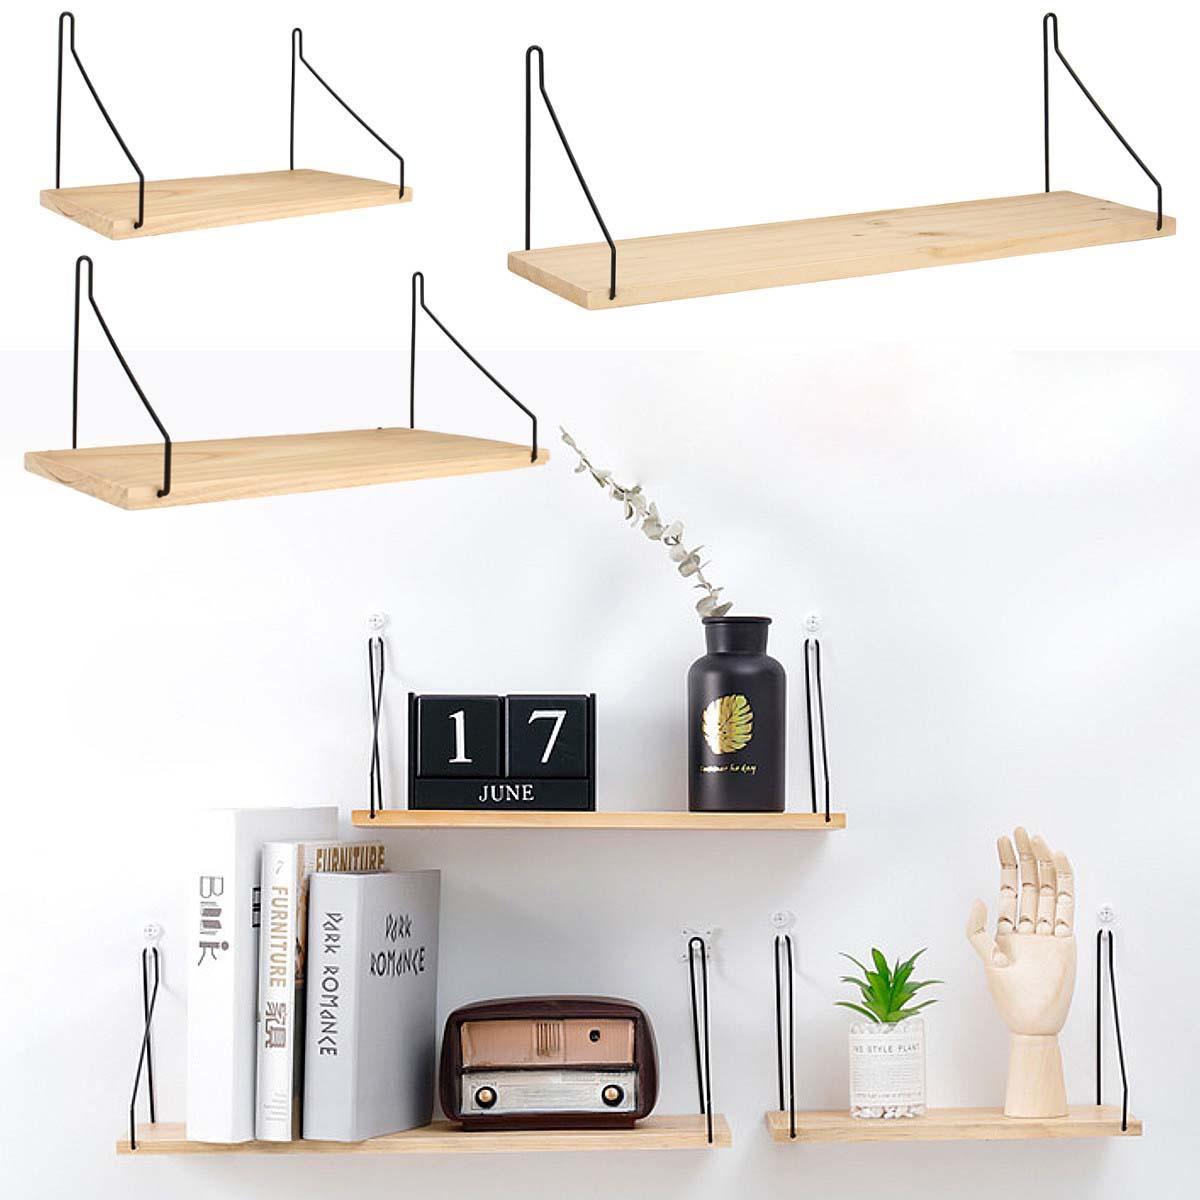 wall shelf wood iron hanging holder storage wall mount rack home display decorations. Black Bedroom Furniture Sets. Home Design Ideas